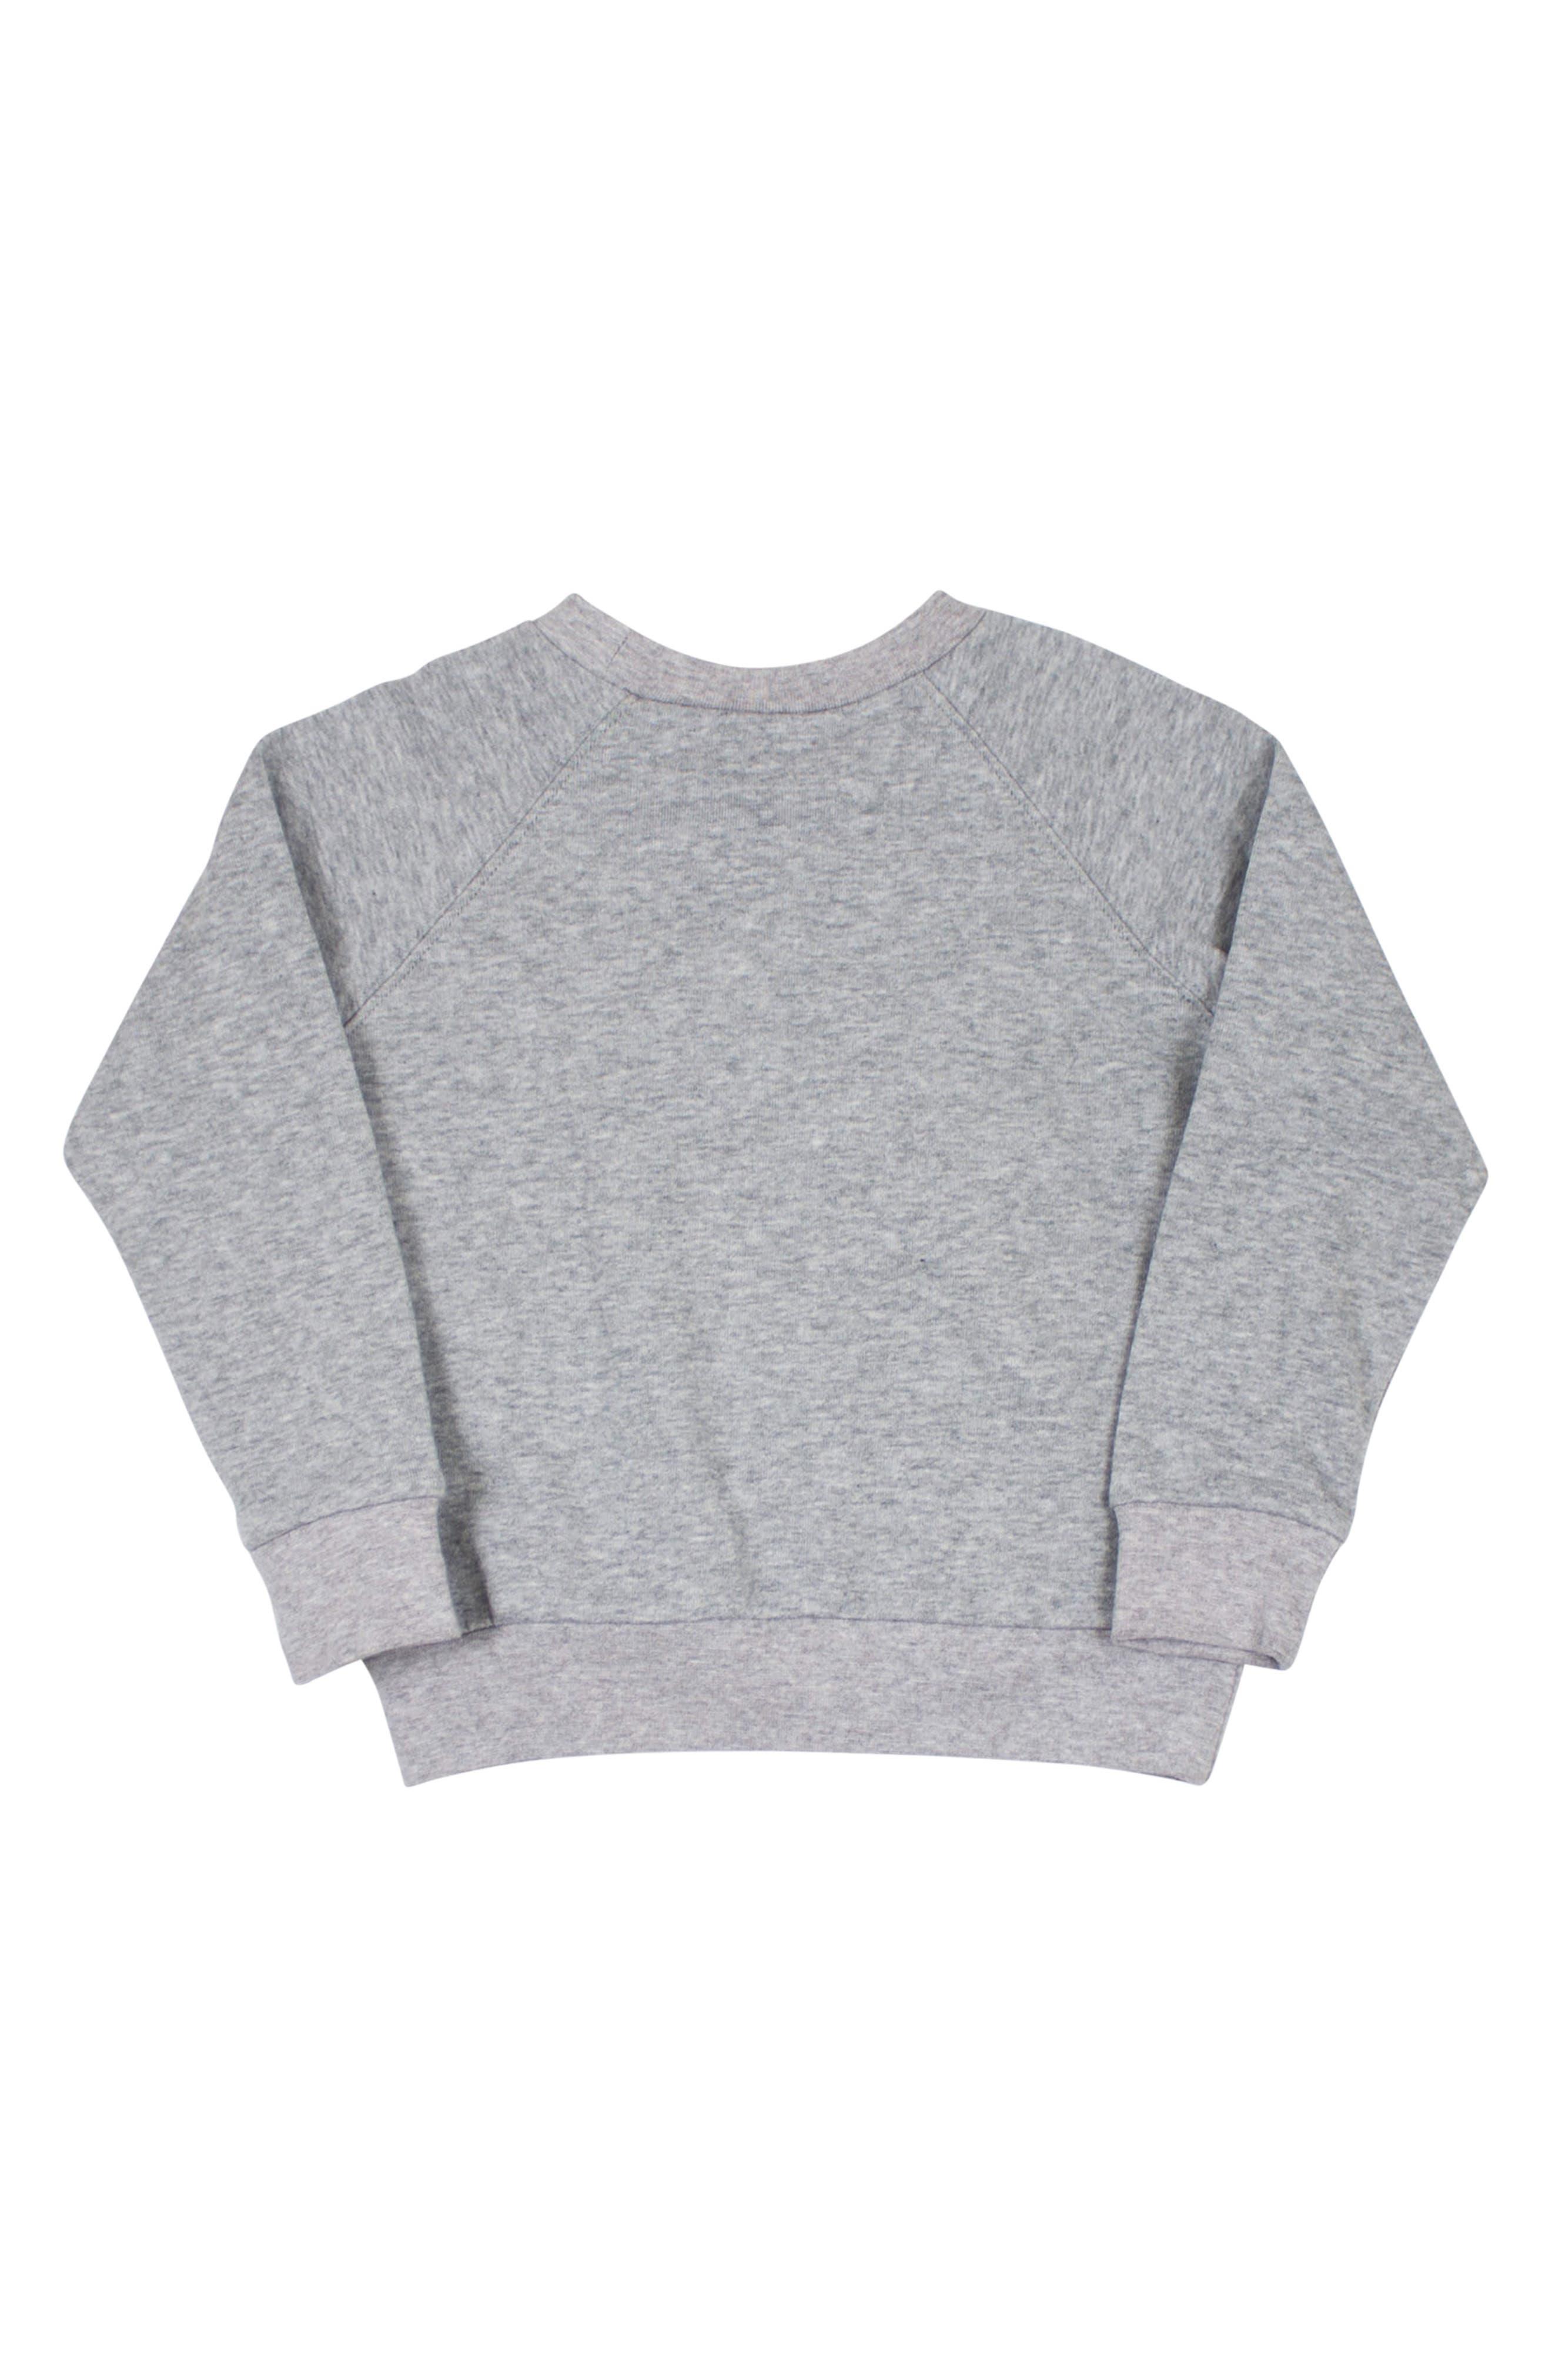 Sunnies Sweatshirt,                             Alternate thumbnail 2, color,                             020